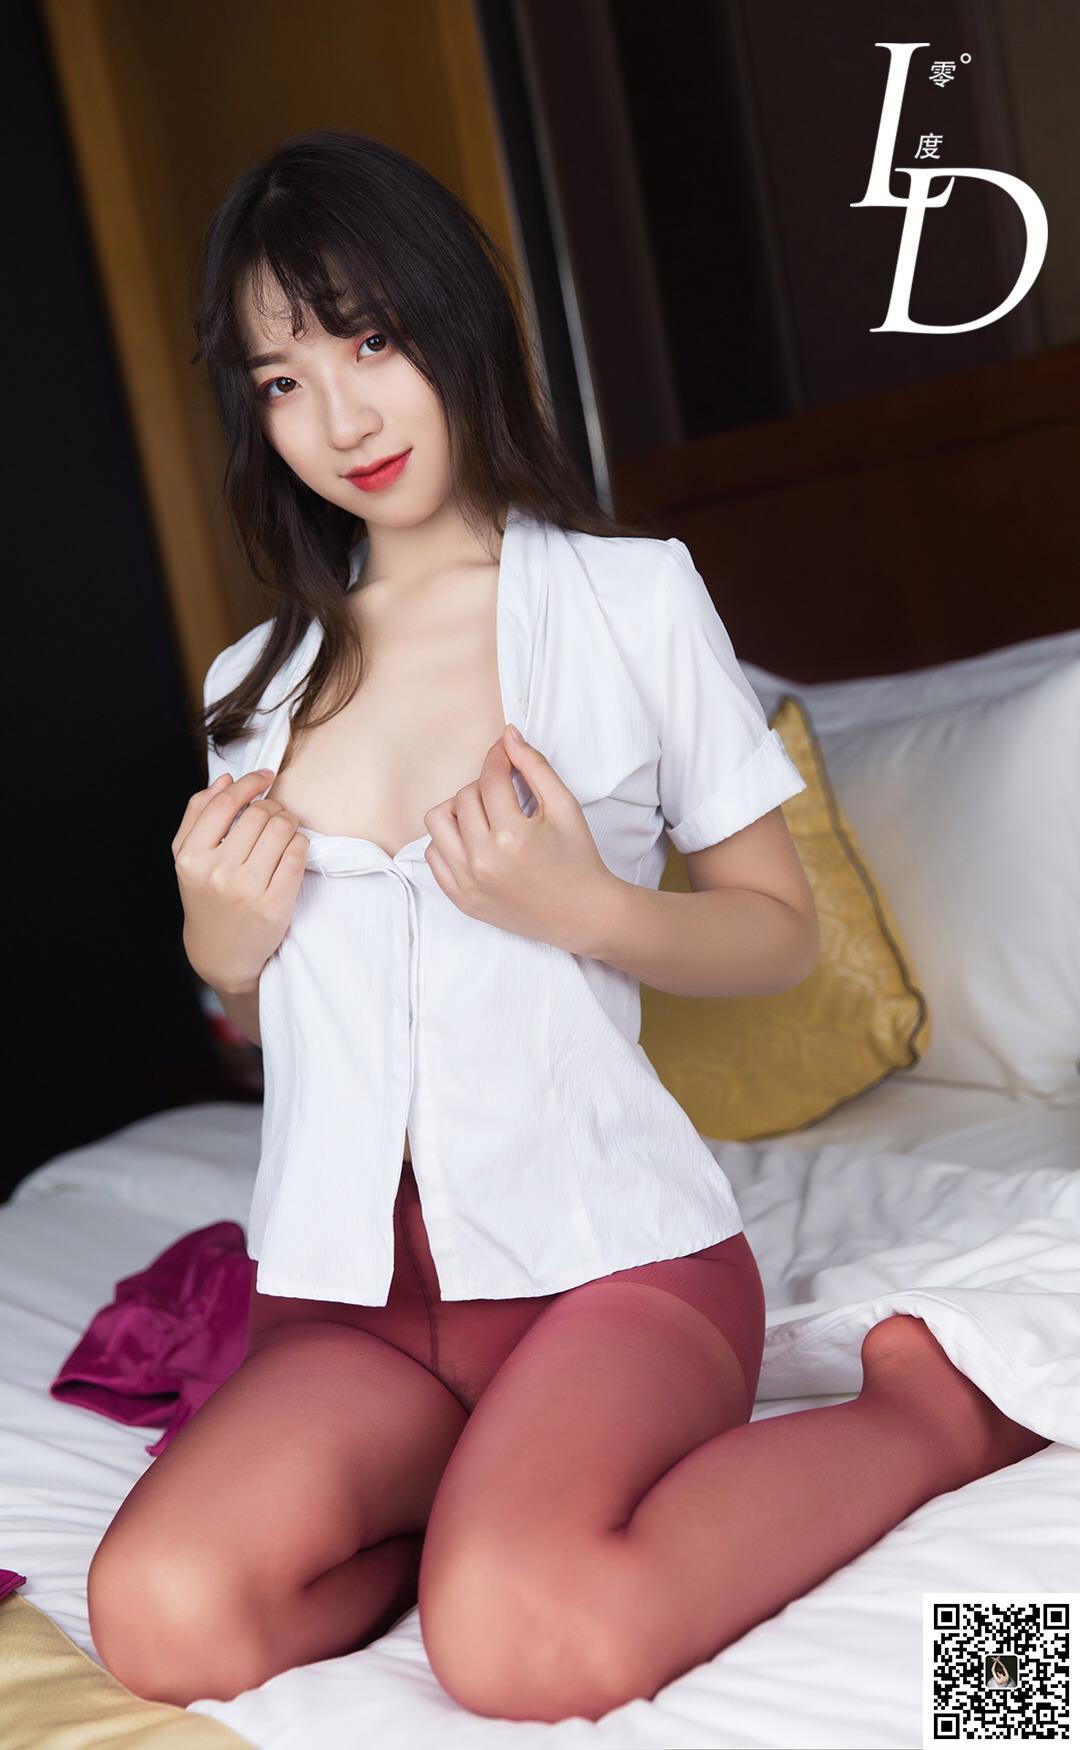 [LD零度]NO.037 萱萱之红丝诱惑[/204MB]